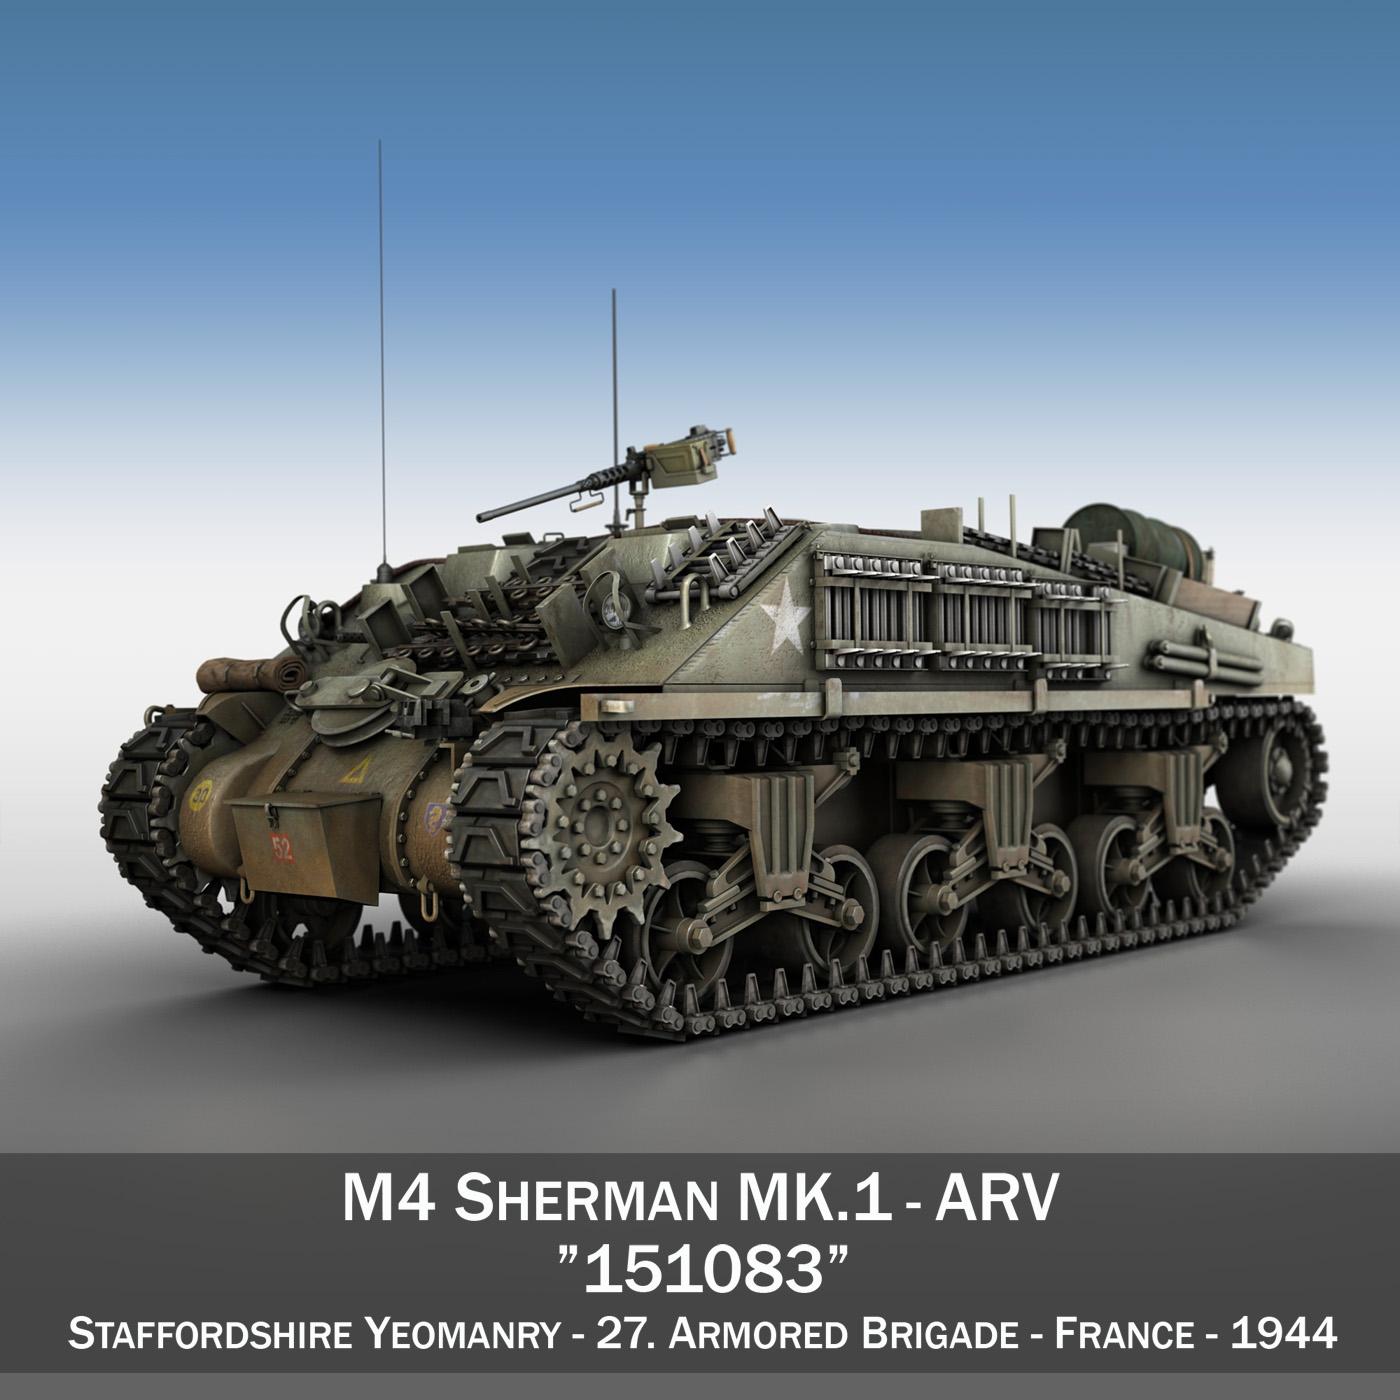 m4 sherman arv mk.i - 151083 3d modell 3ds fbx c4d lwo obj 282116